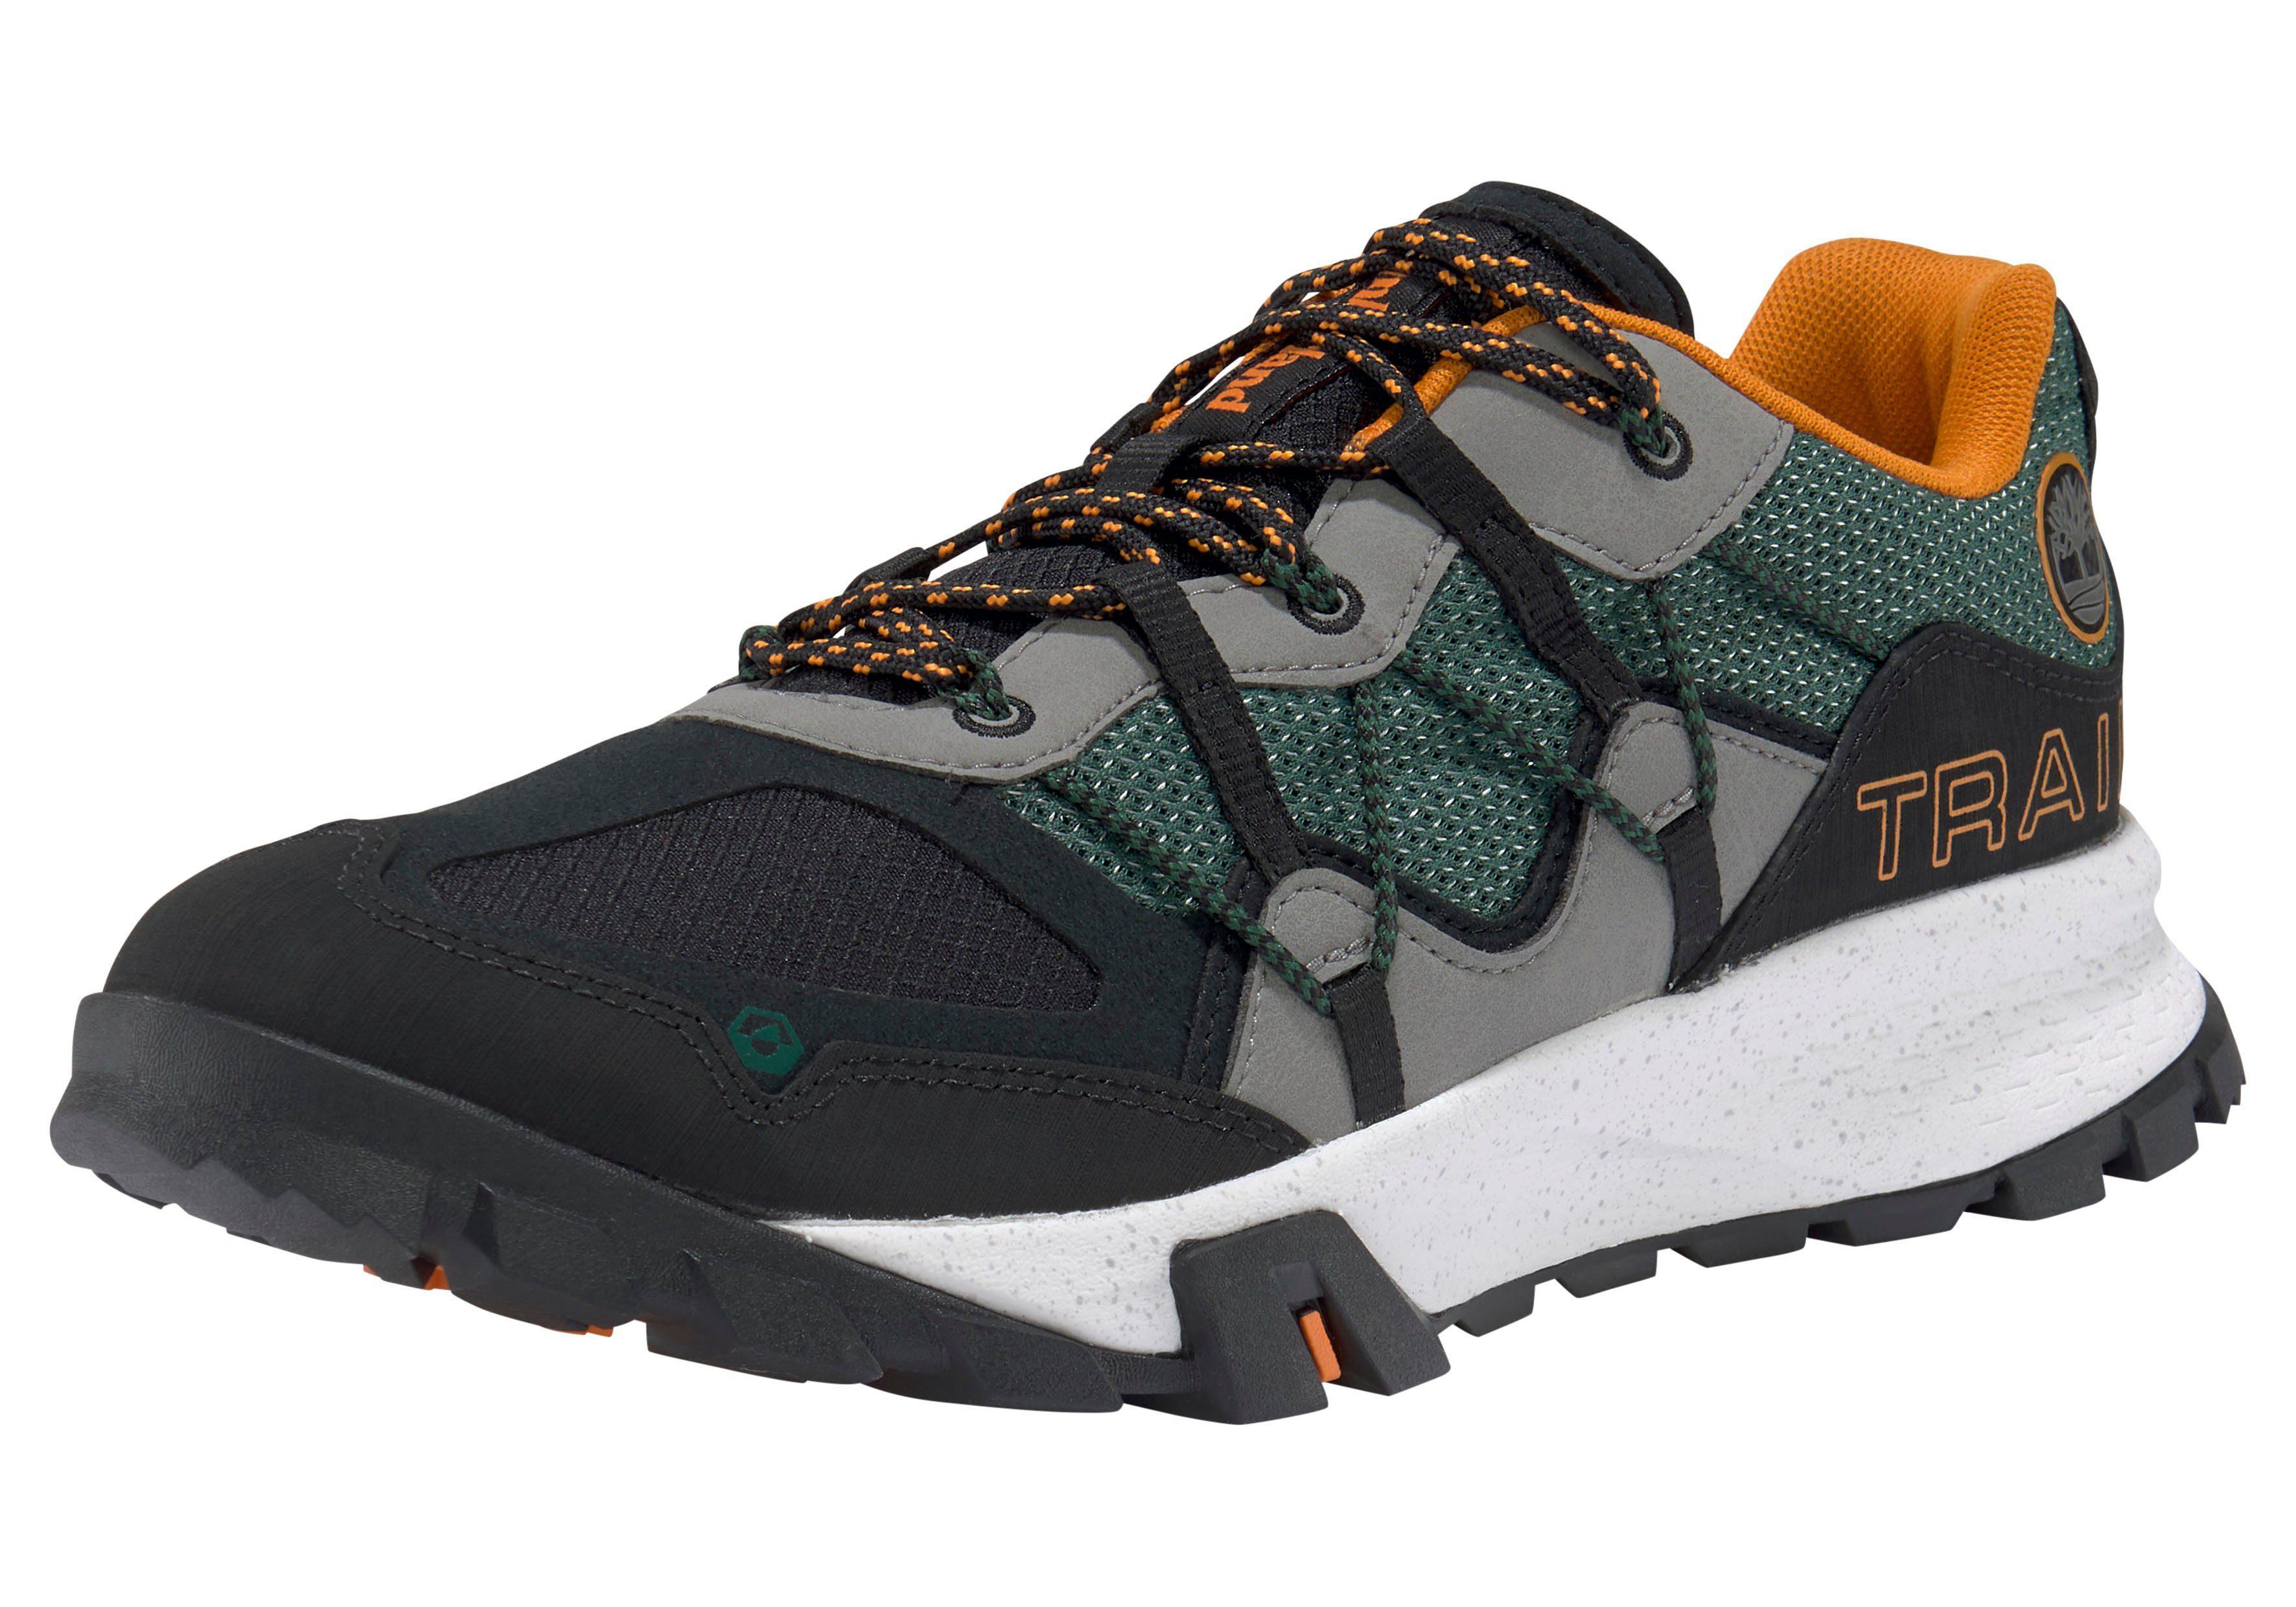 Schoenen Salomon EFFECT GTX® W Damen Schuhe Multifunktion